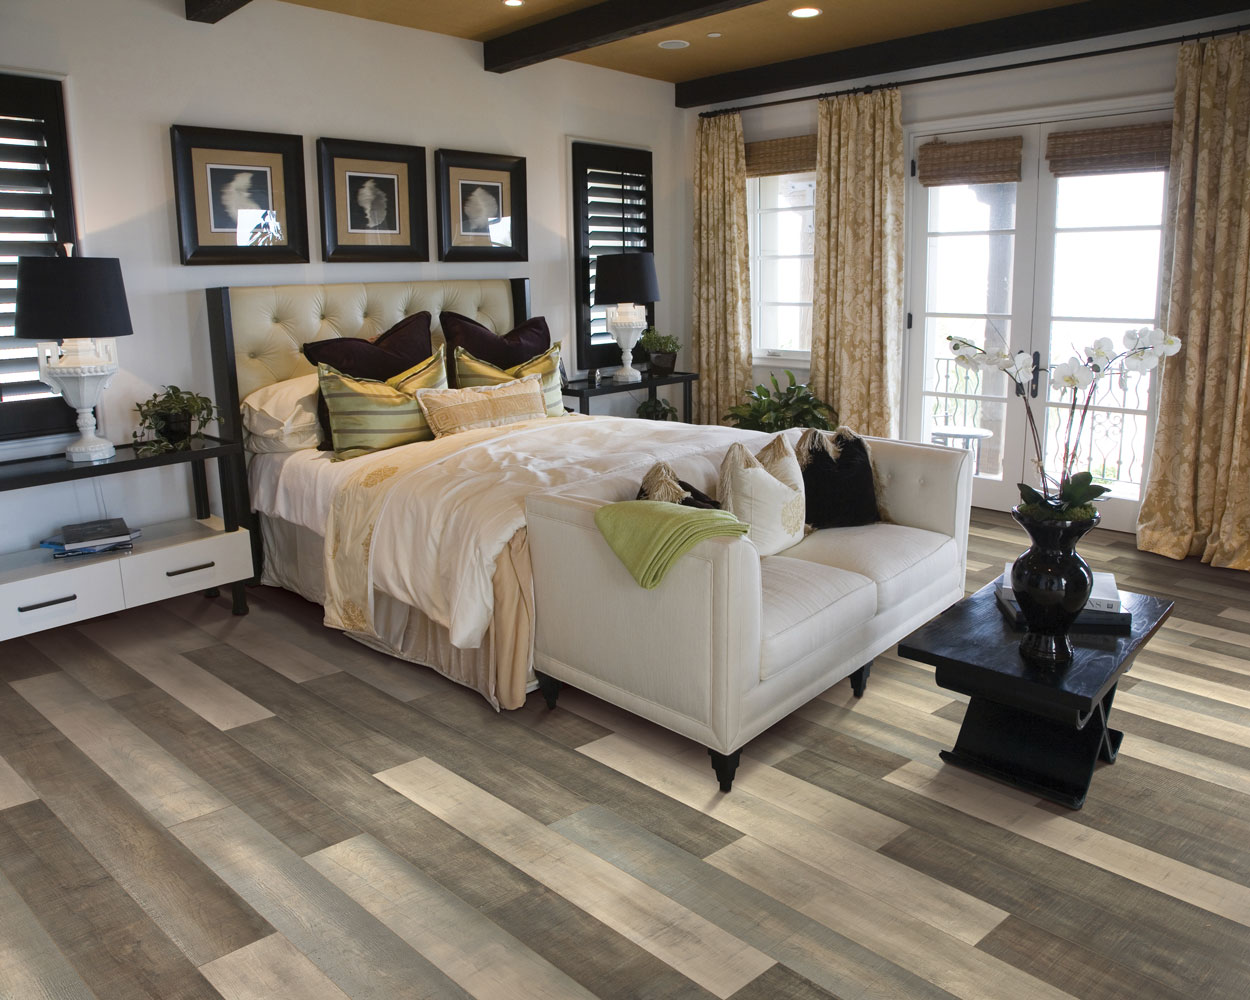 Laminate 3 Malkin S Flooring, Multi Colored Laminate Flooring